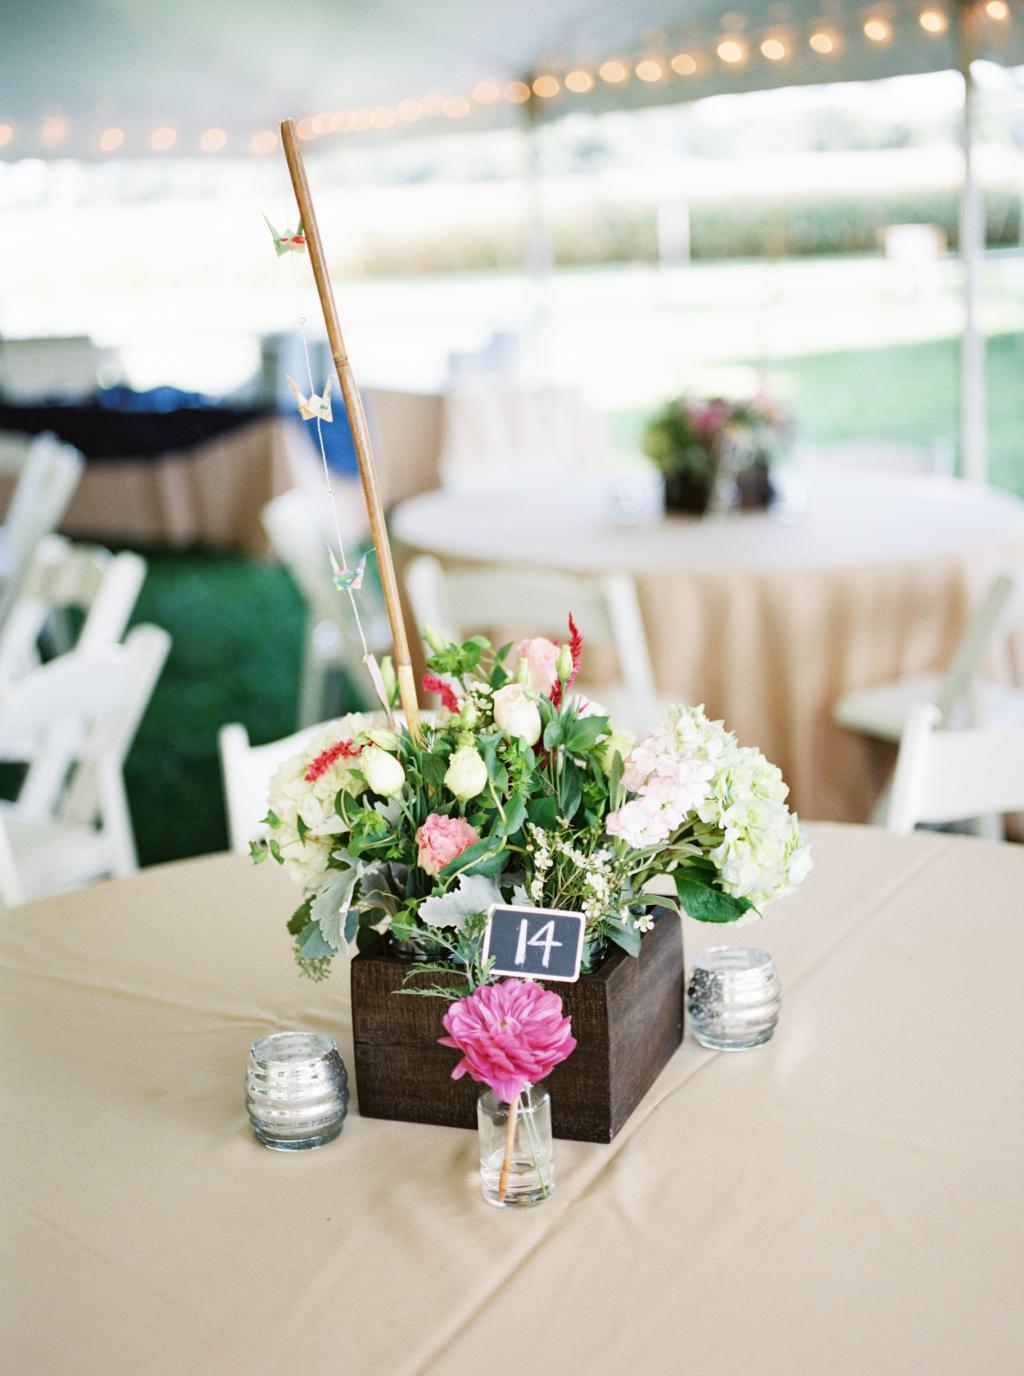 haley-richter-photography-buena-vista-confrence-center-wedding-summer-201